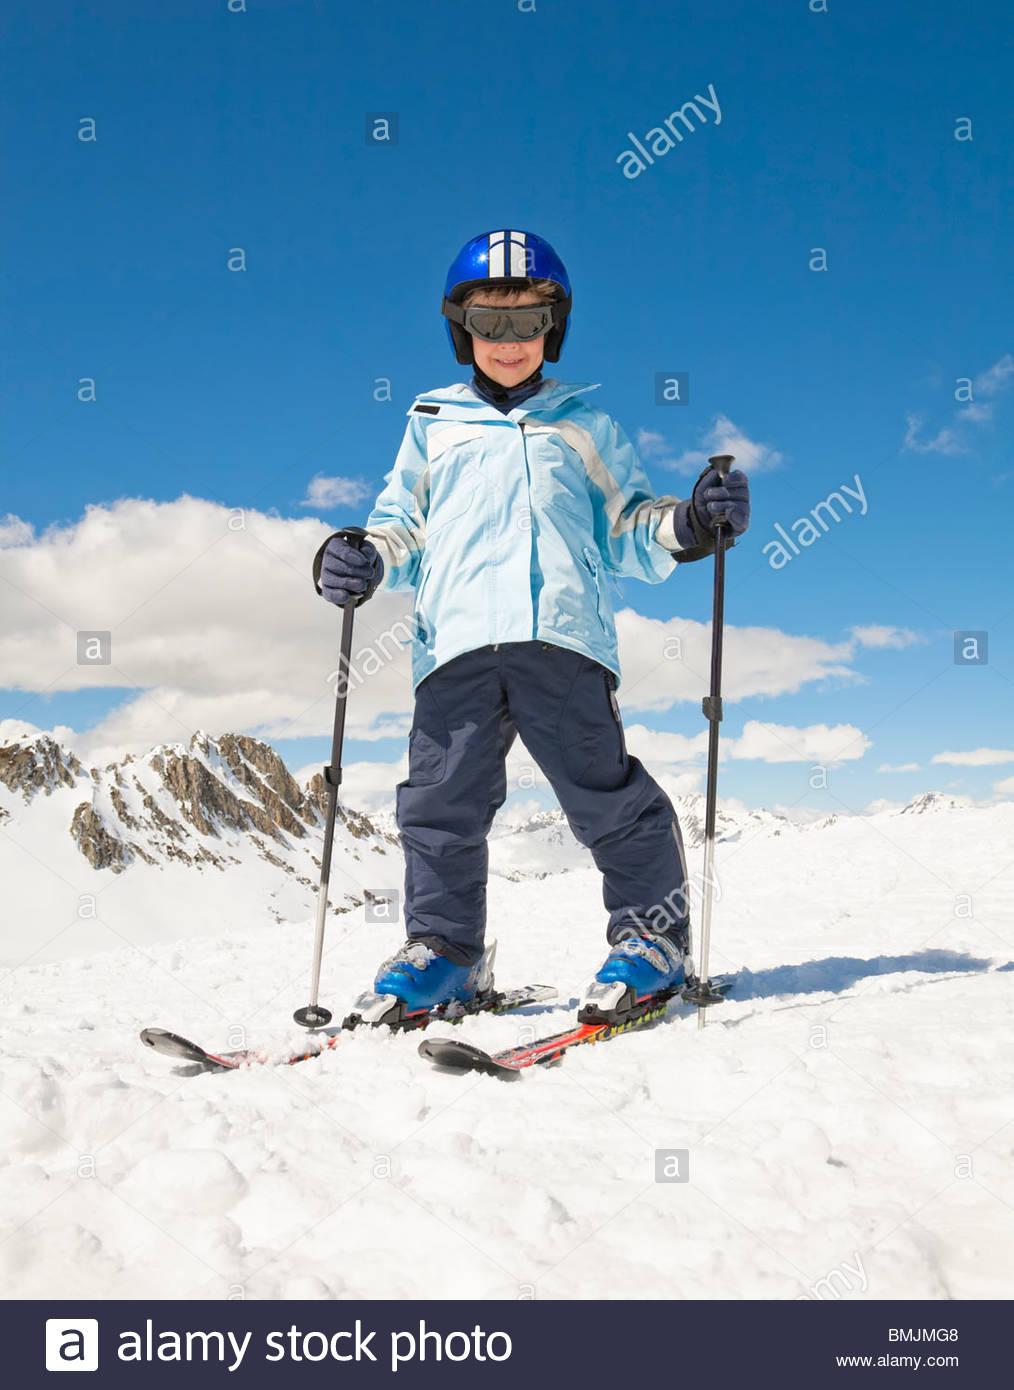 Boy skiing in snow, mountain backdrop - Stock Image